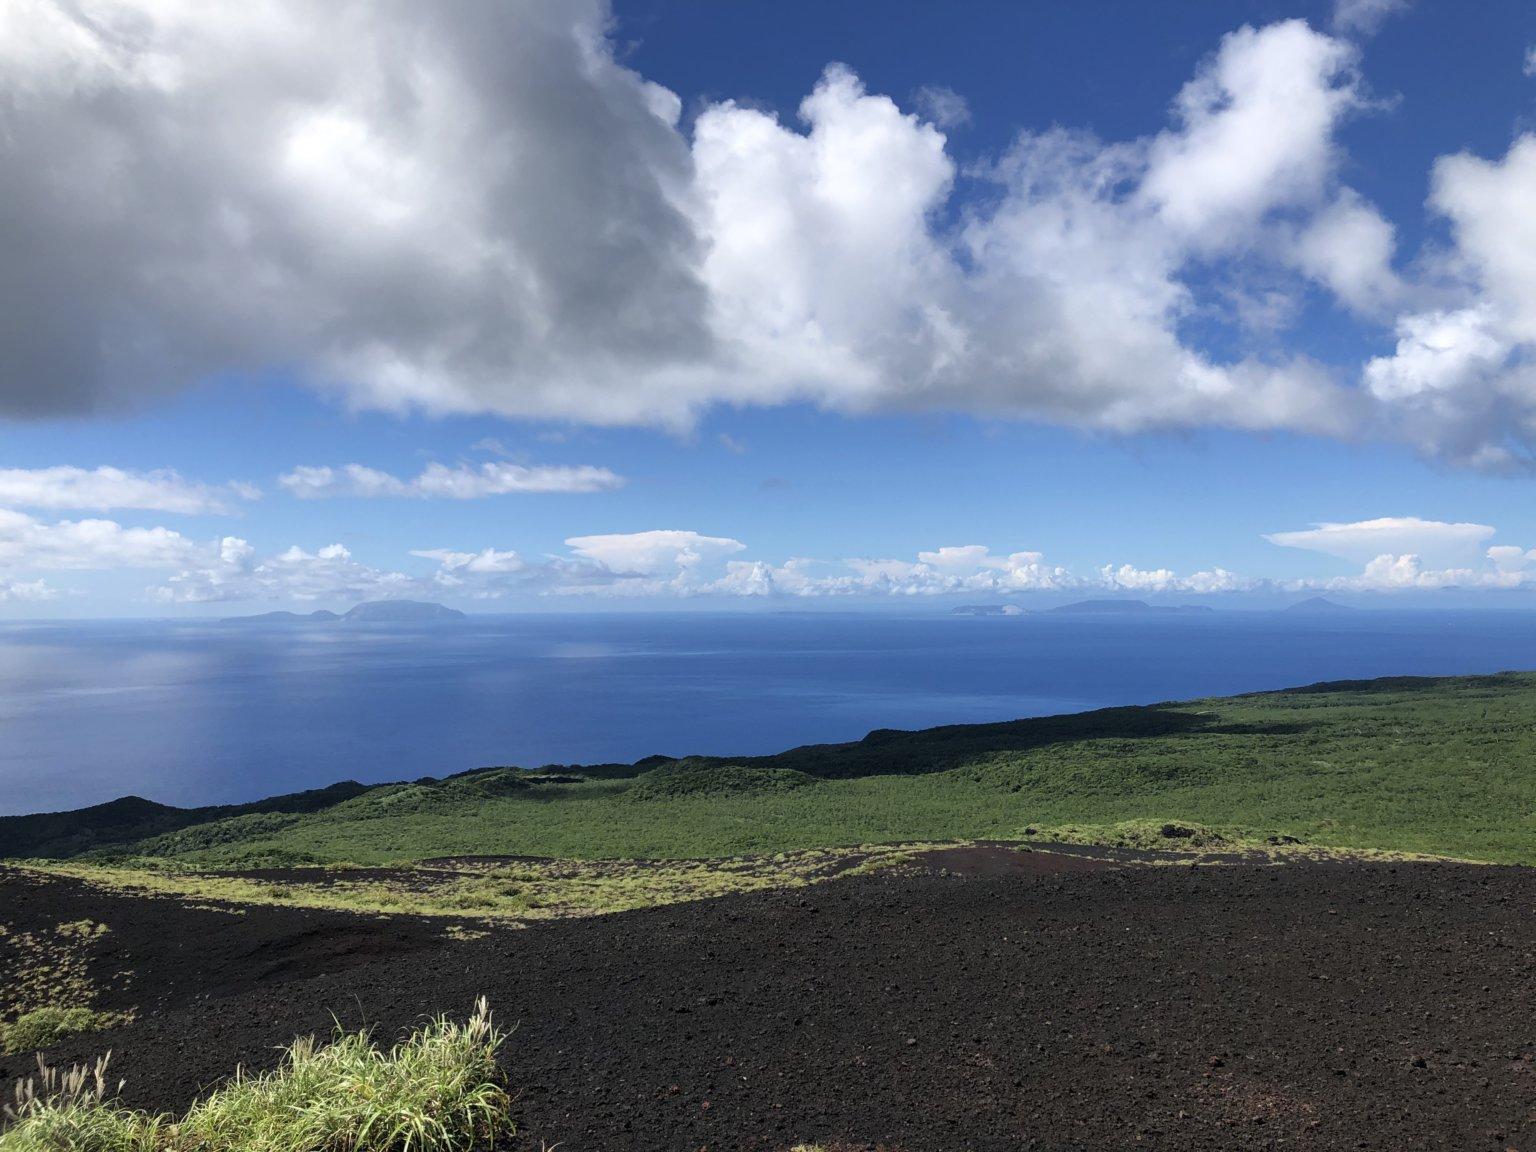 IMG 7252 1536x1152 - 【東京 三宅島】海、火山、星。最高の自然を満喫しよう!